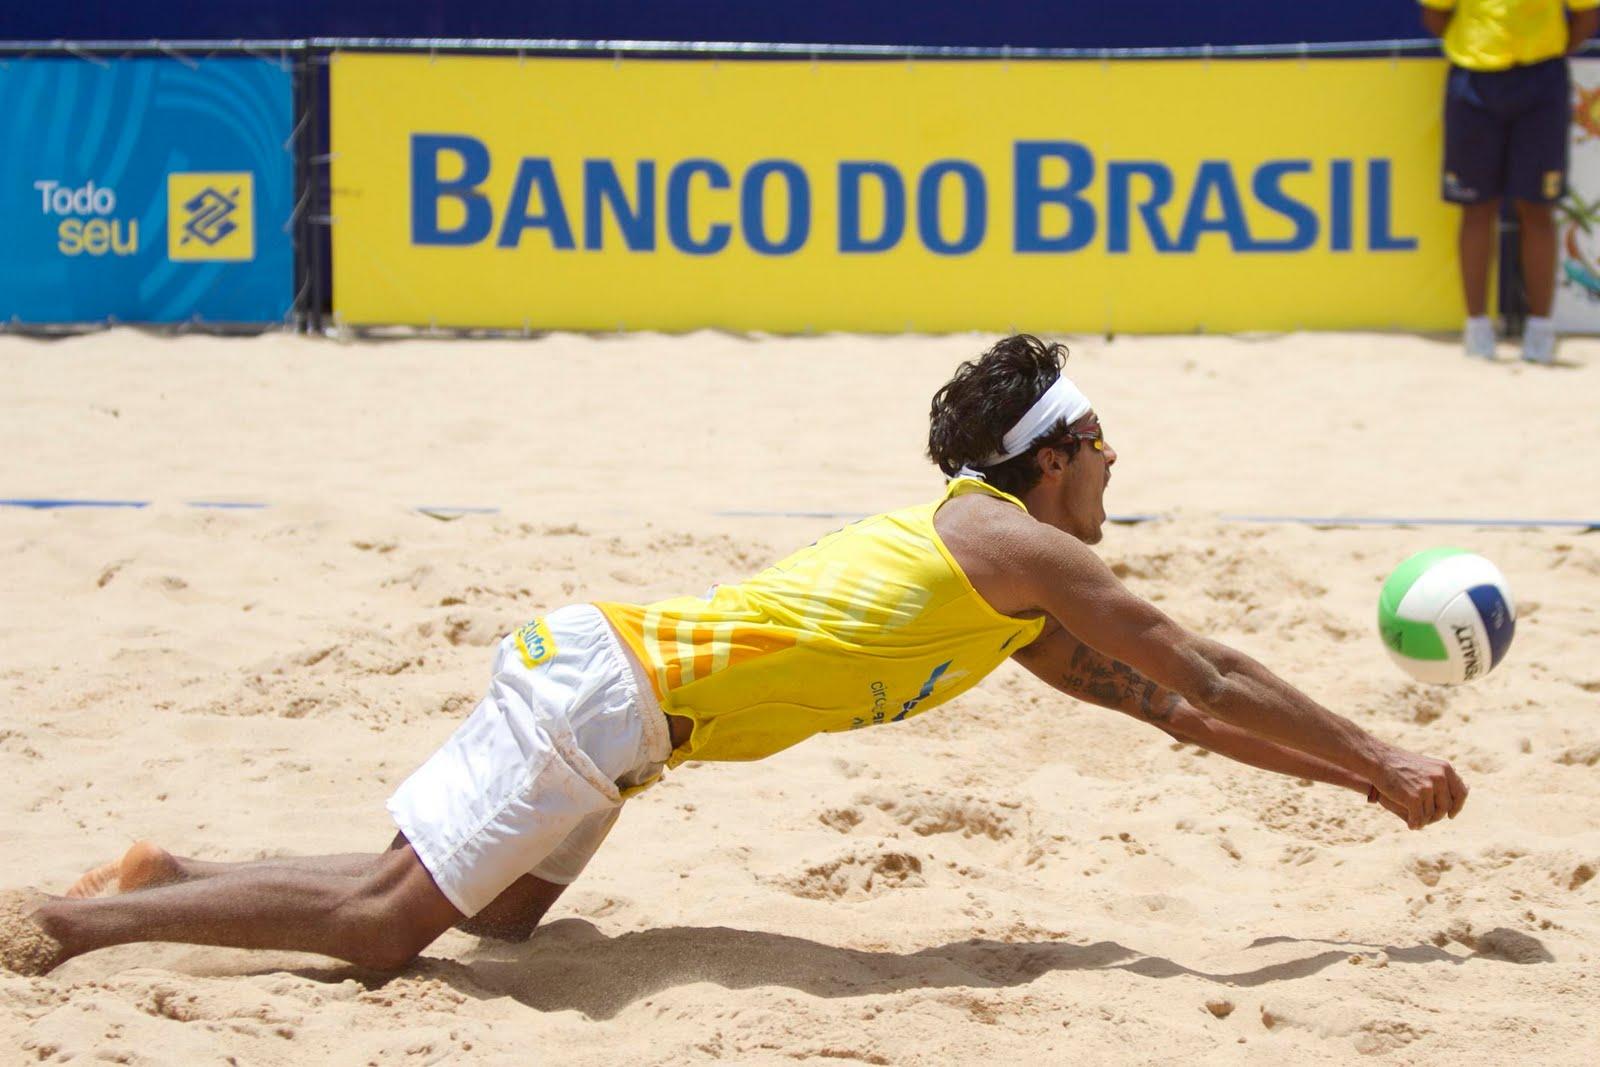 Circuito Banco Do Brasil : Fotos da etapa de joão pessoa do circuito banco brasil